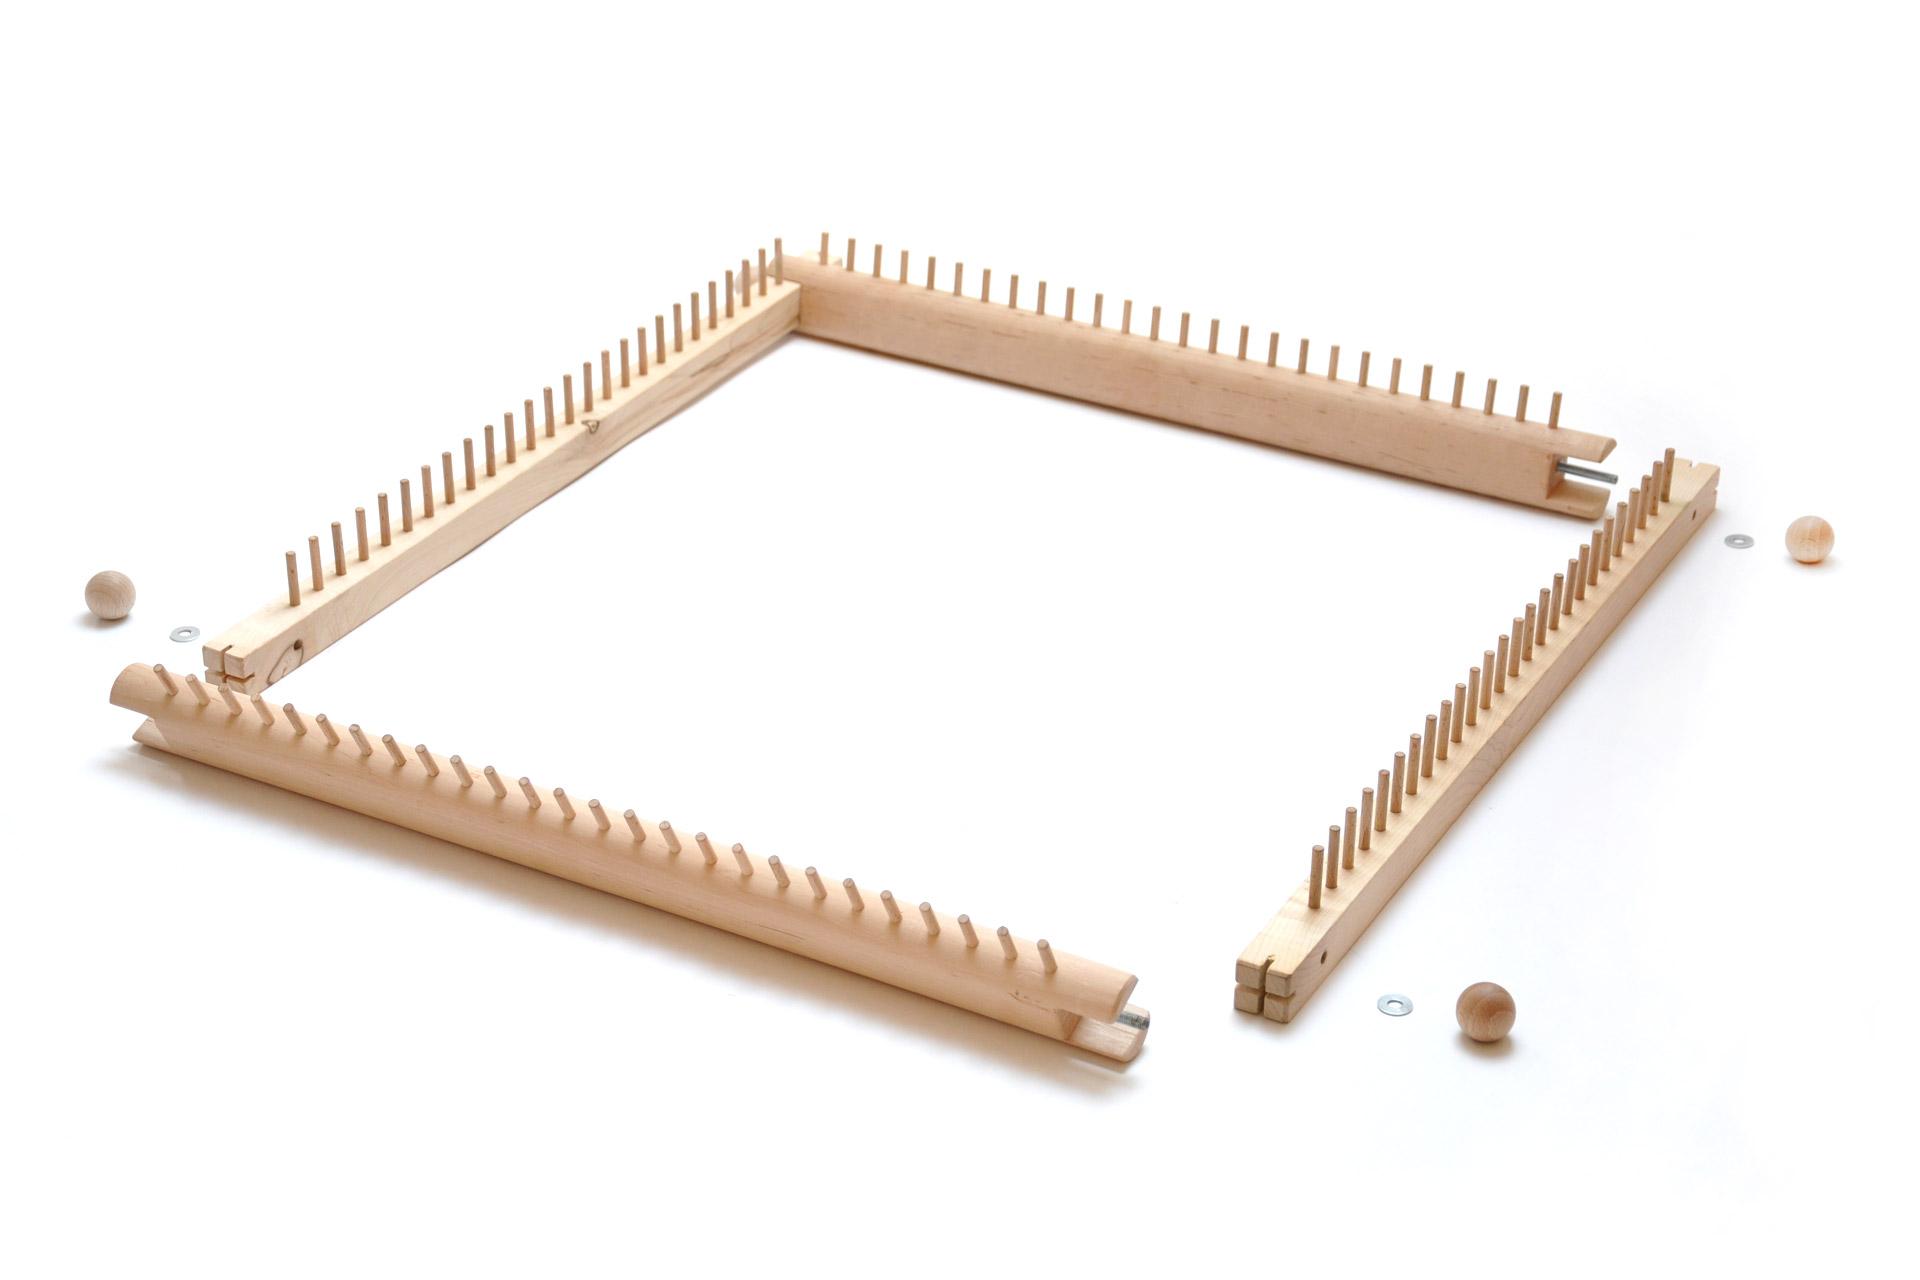 Webrahmen-Holz-Sitzkissen-Wolle-gefilzt-ksg